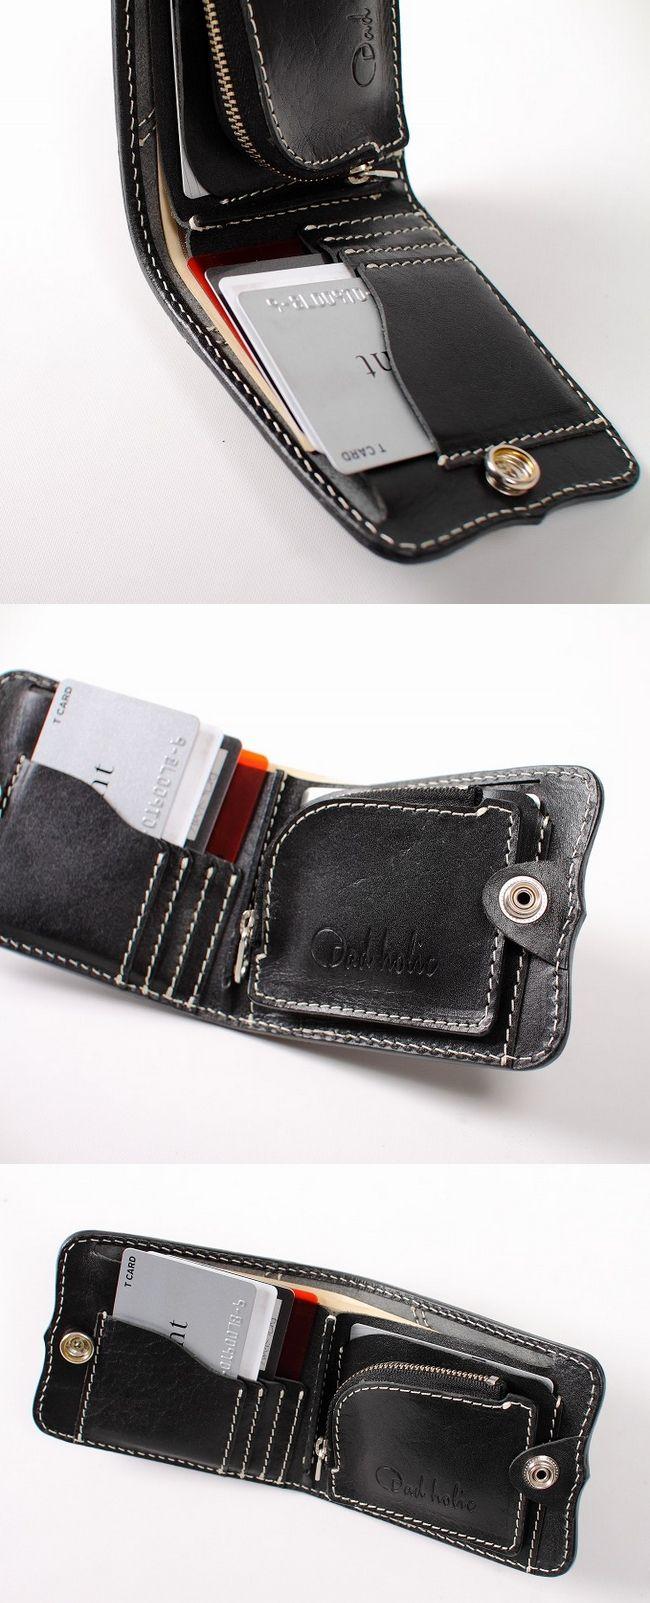 【DEGNER】DAD HOLIC 皮革對摺錢包 - 「Webike-摩托百貨」